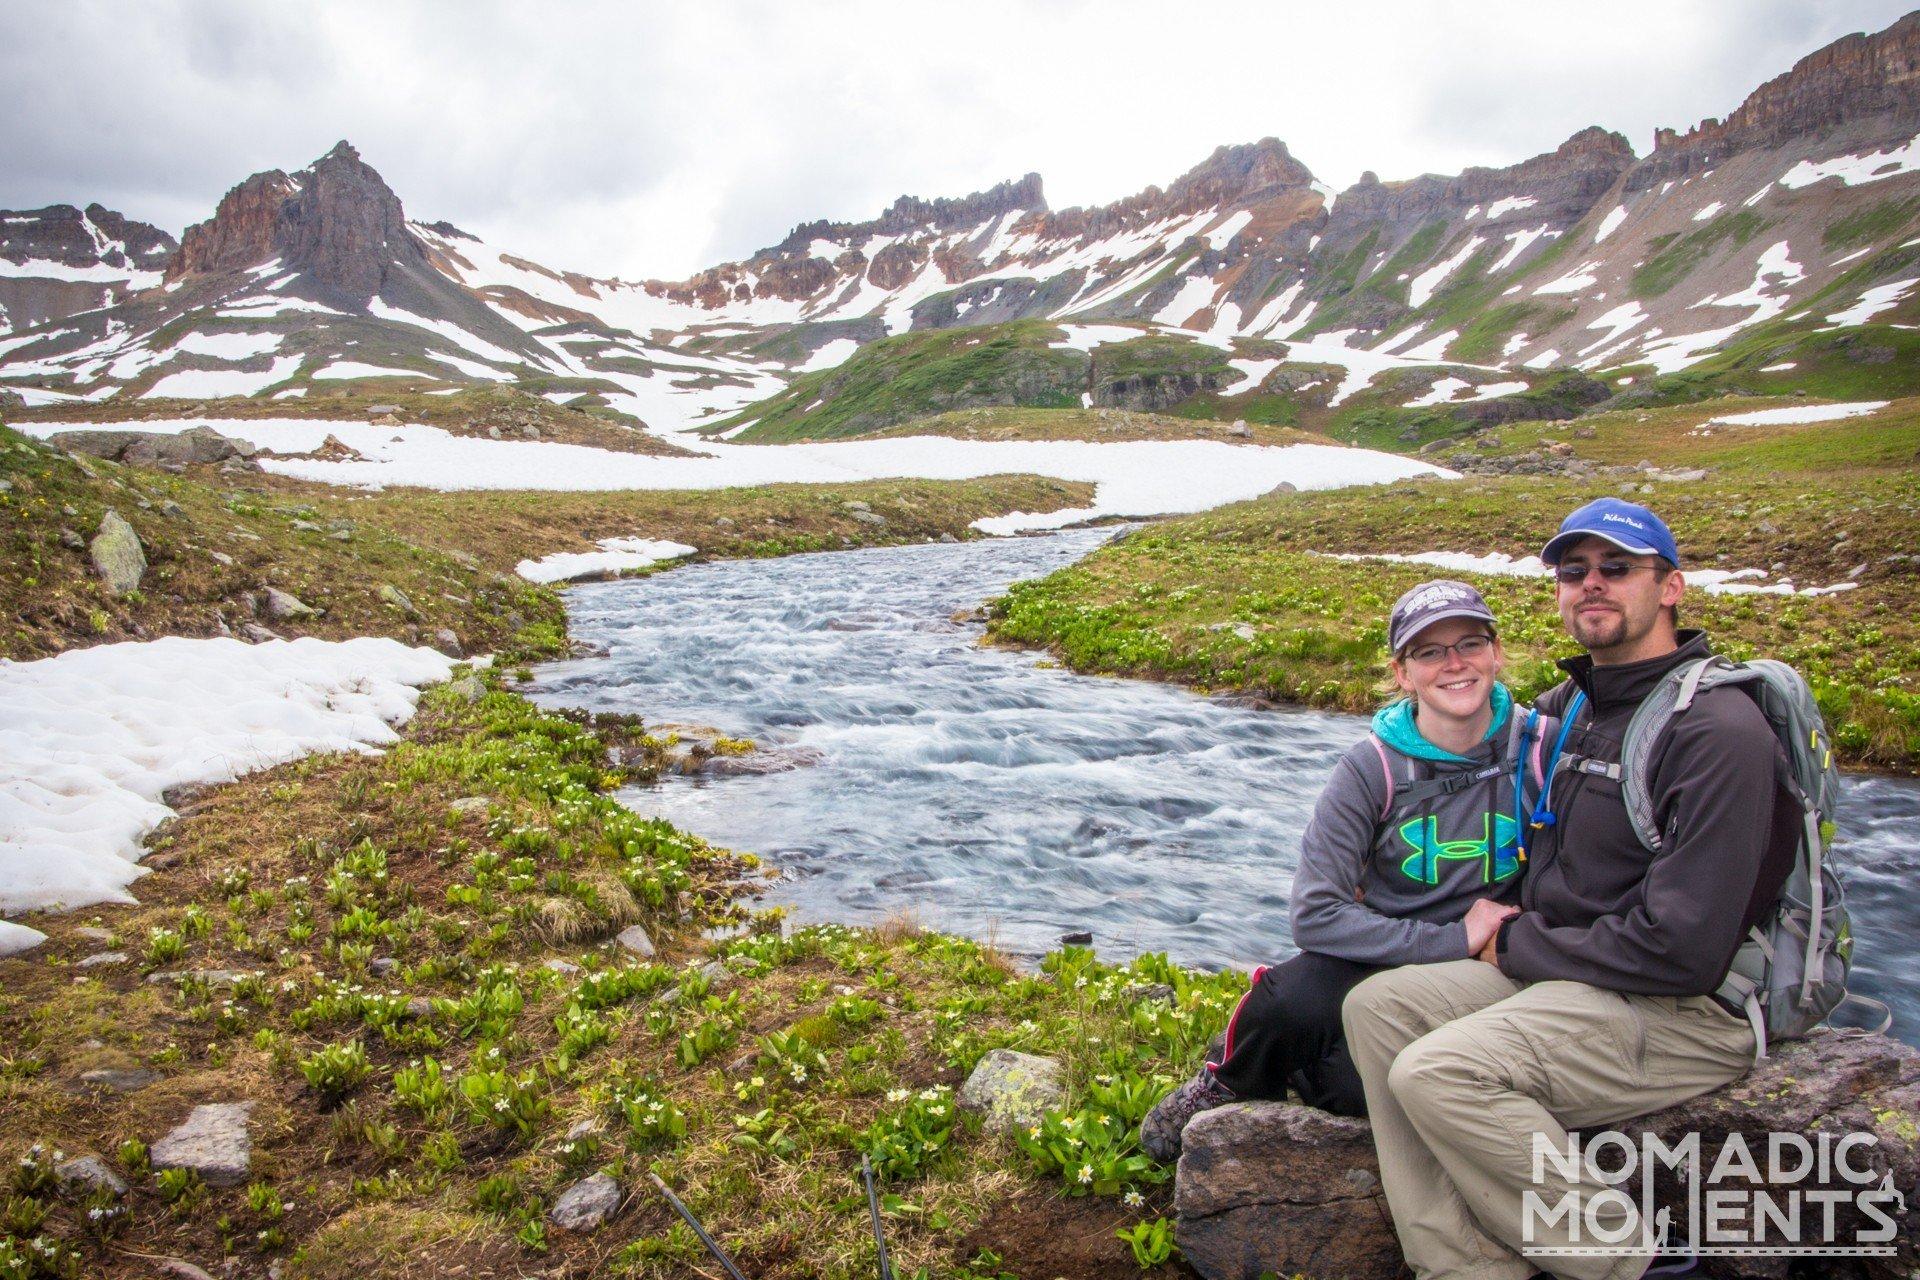 Two hikers at Colorado's Ice Lake Basin